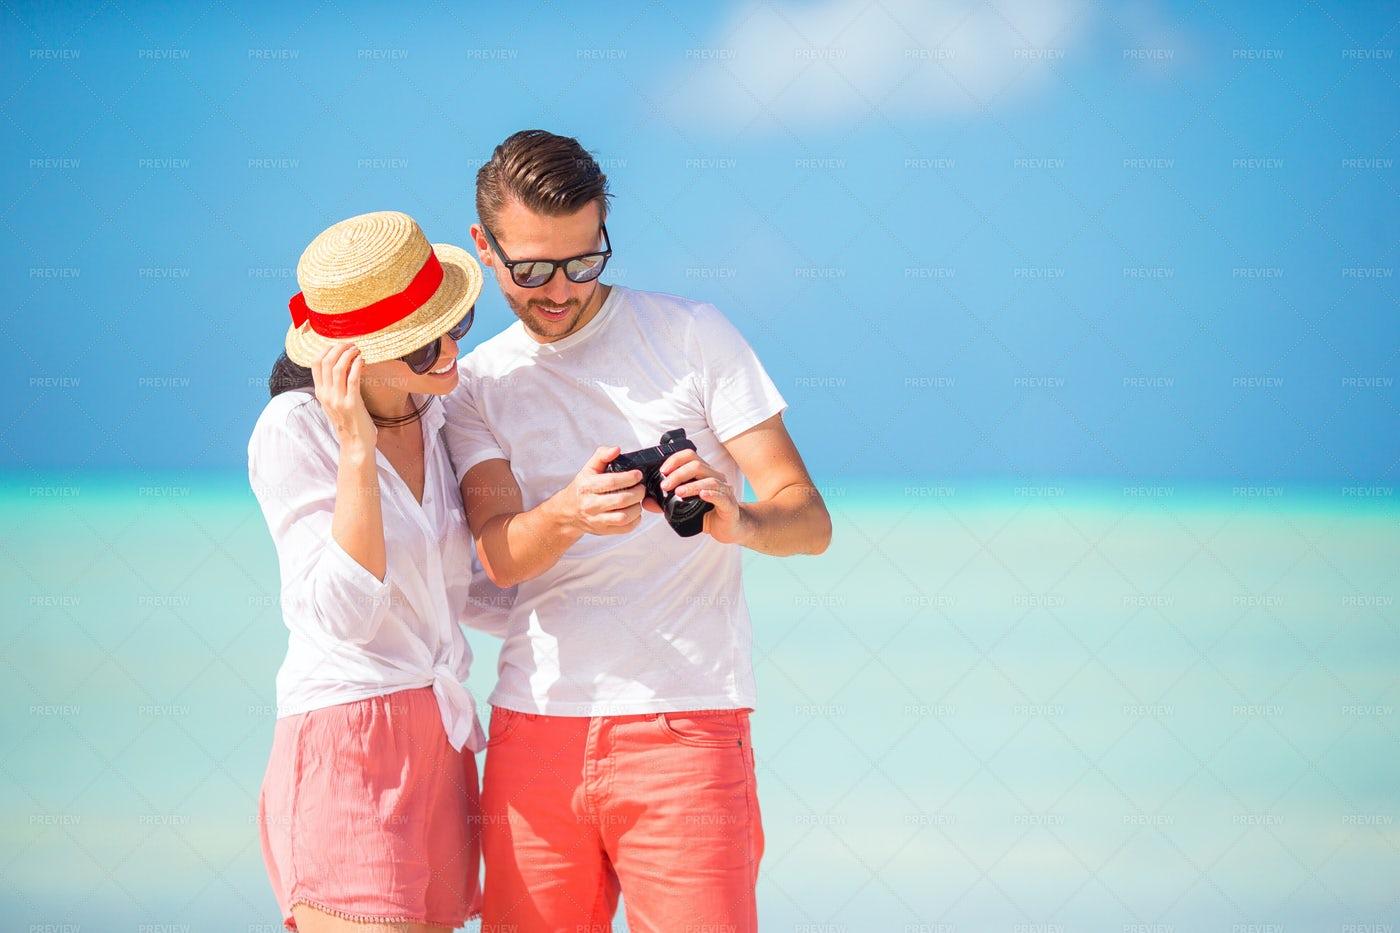 Reviewing Vacation Photos: Stock Photos